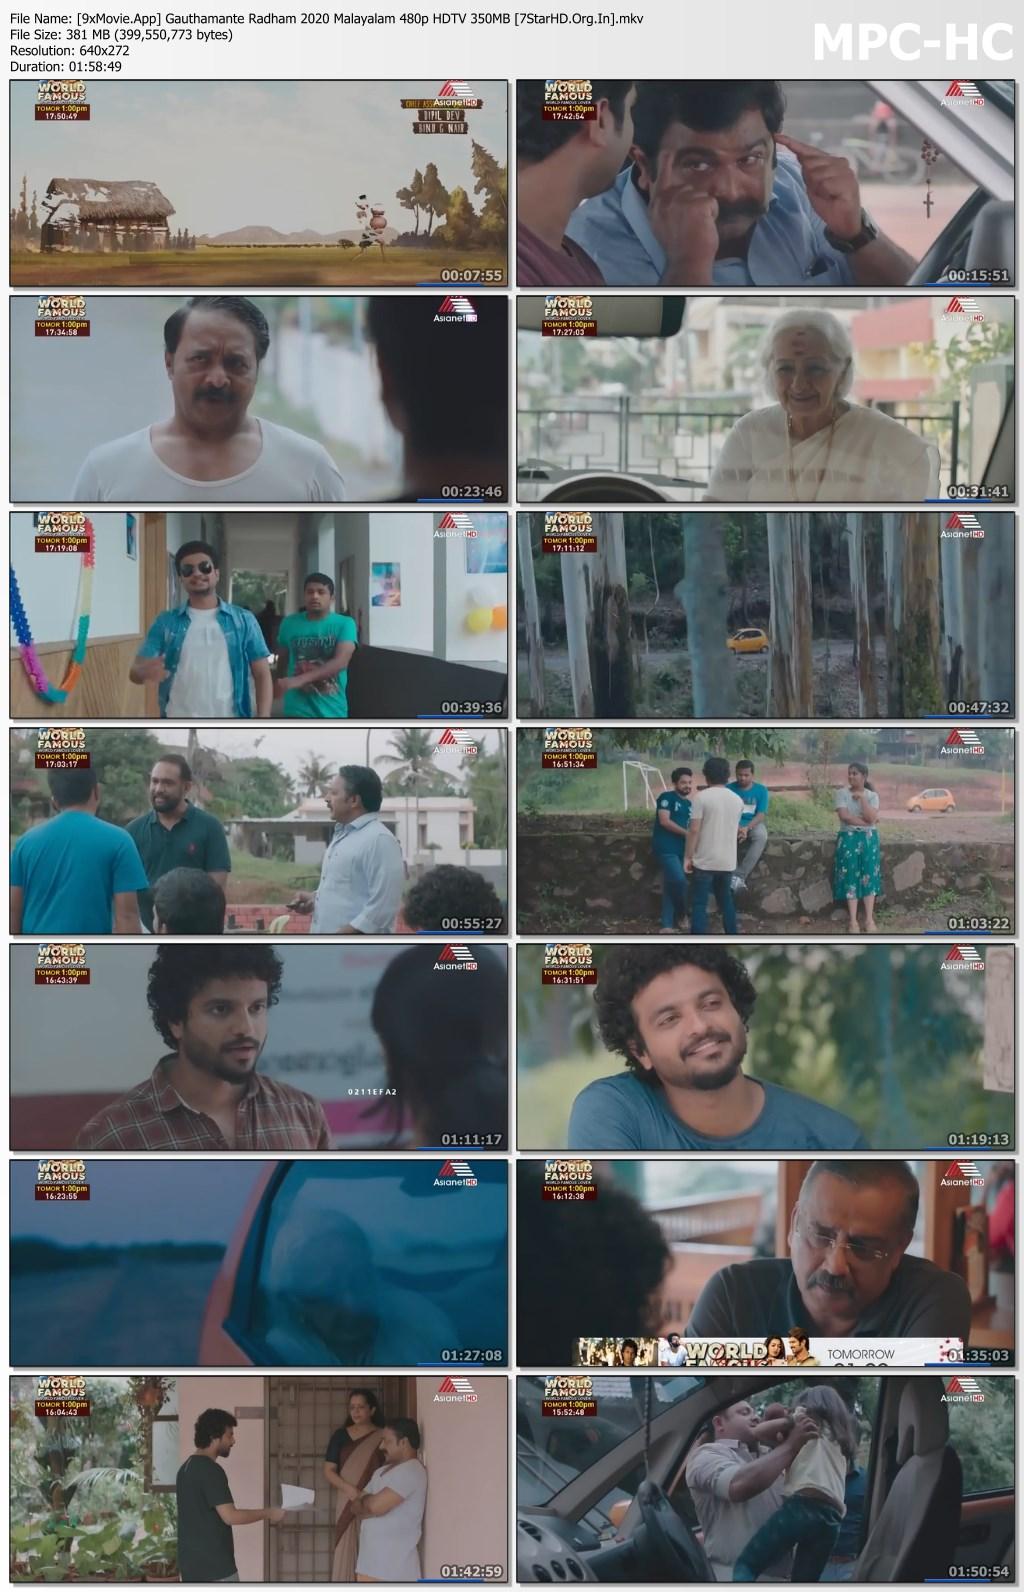 Gauthamante Radham 2020 Malayalam 480p HDTV x264 350MB